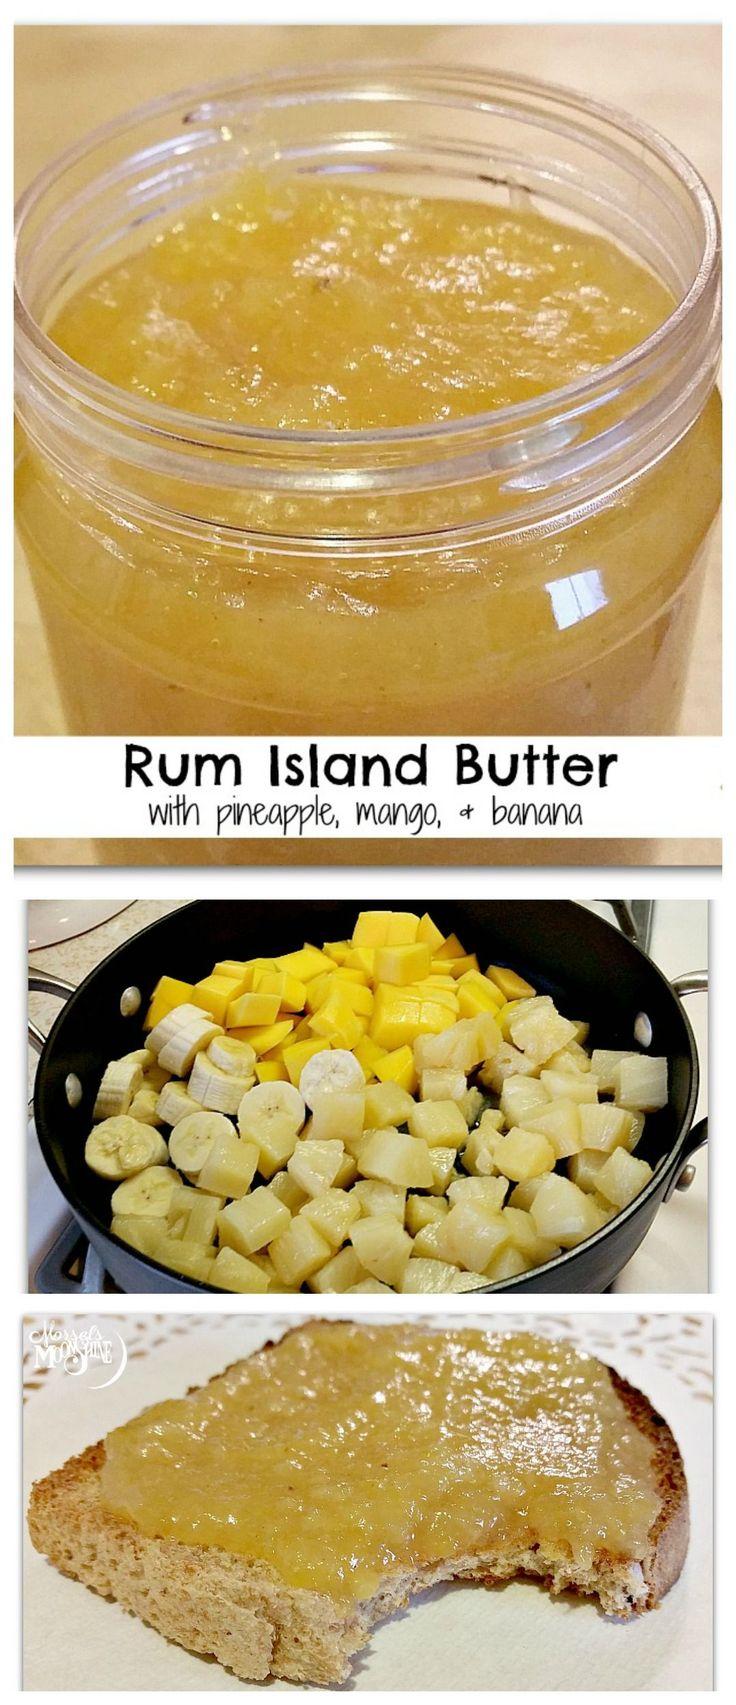 Rum Island Butter with Pineapple, Mango & Banana!